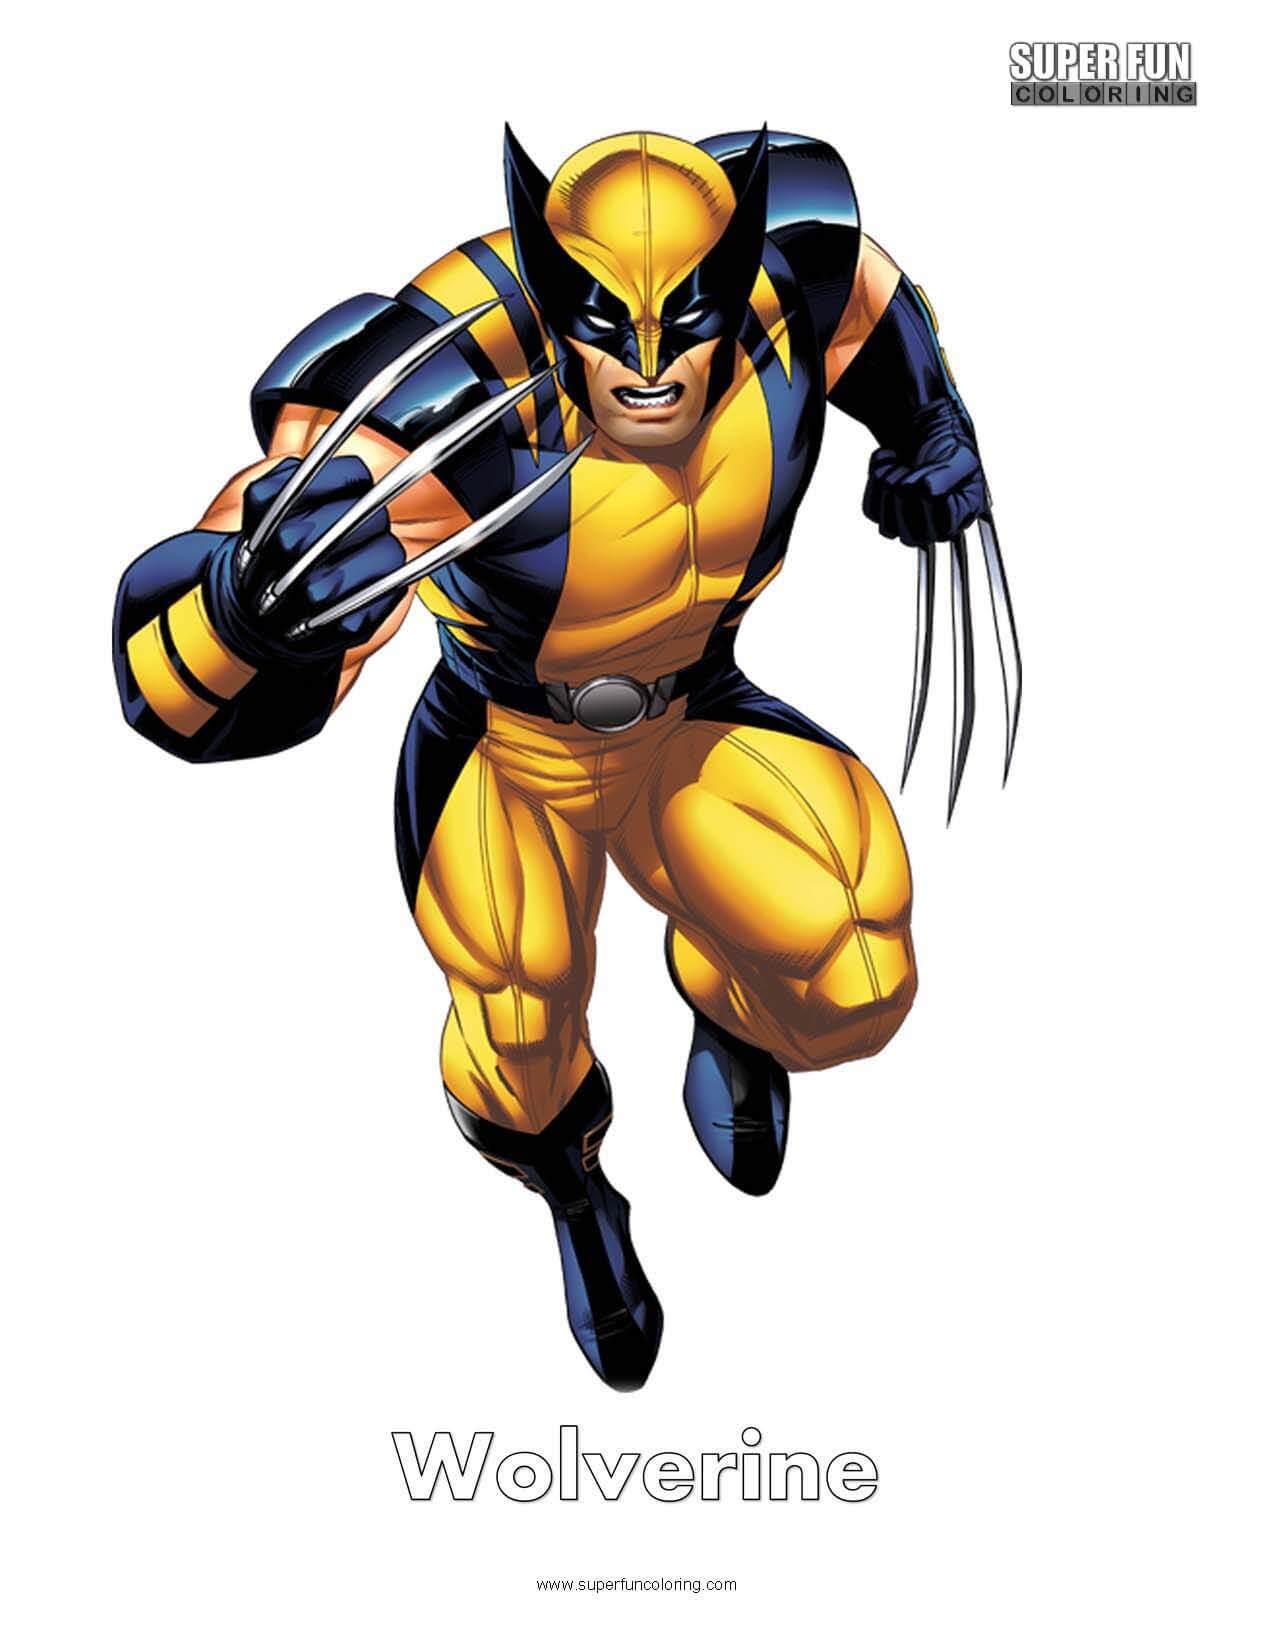 Wolverine Free Superhero Coloring Page